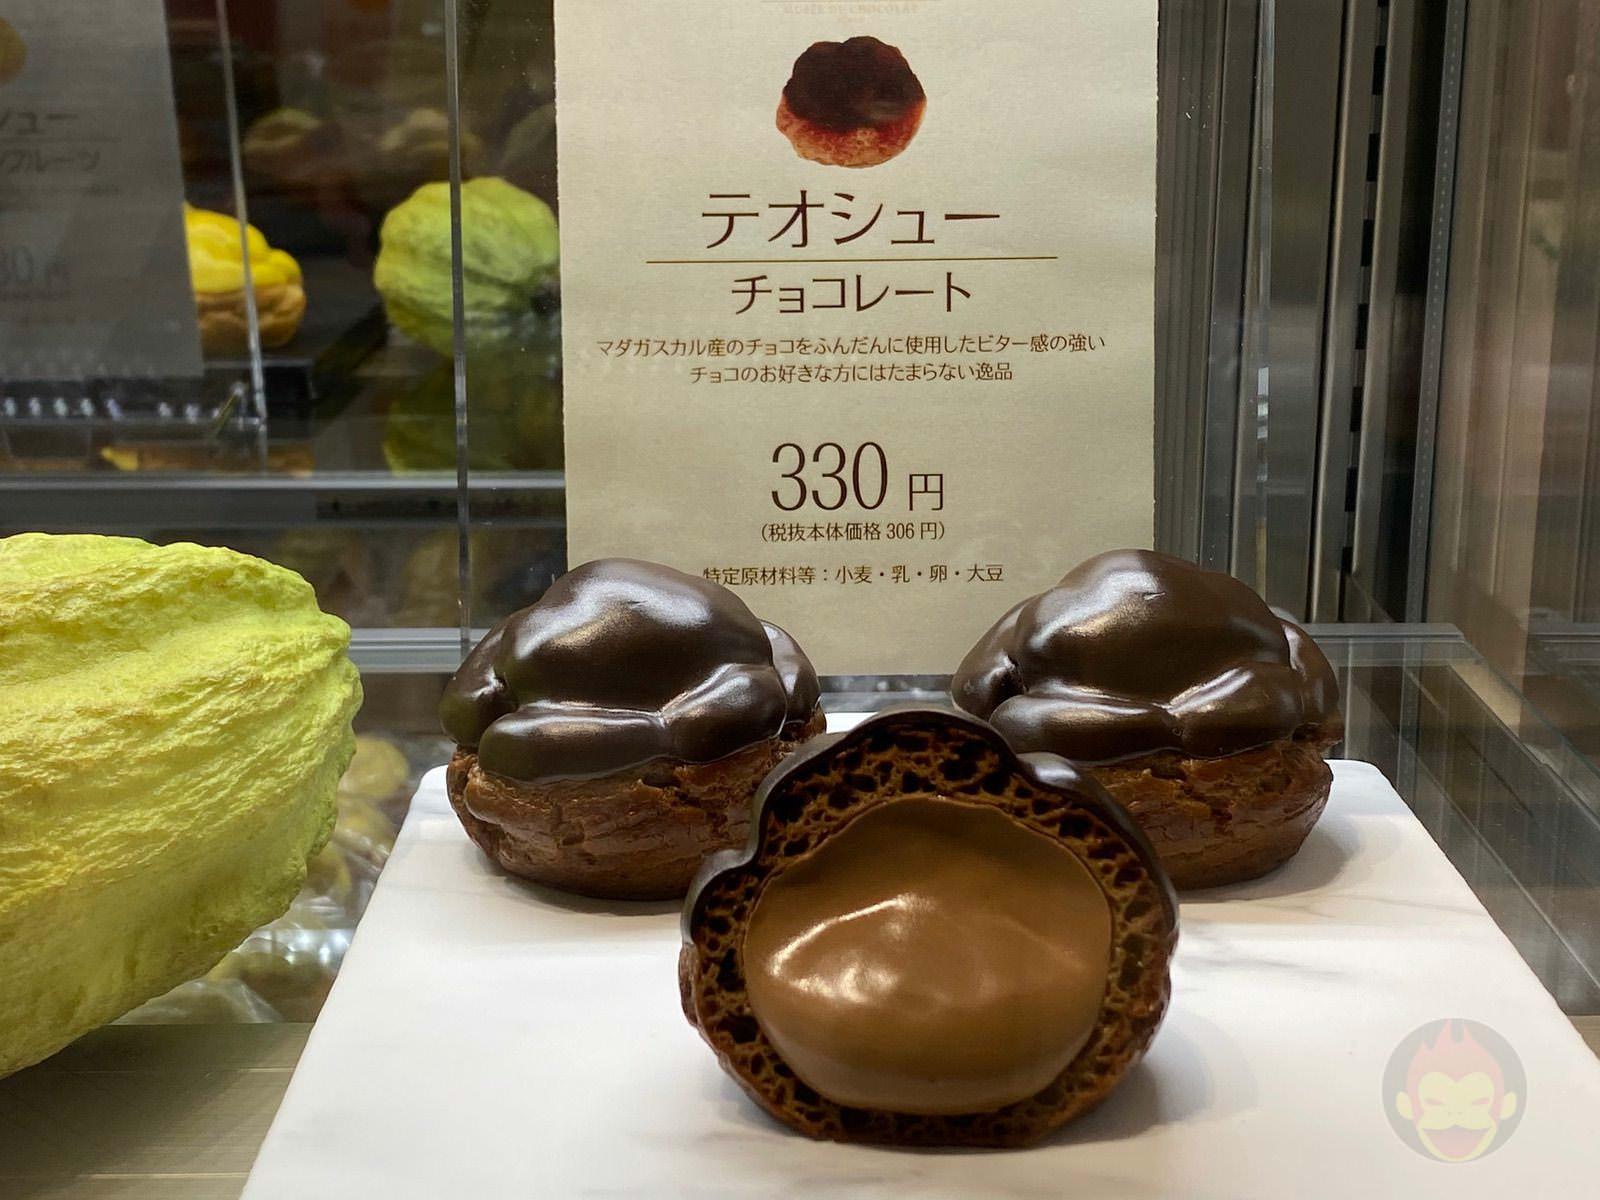 Shibuya-Scramble-Square-Food-I-Ate-29.jpeg